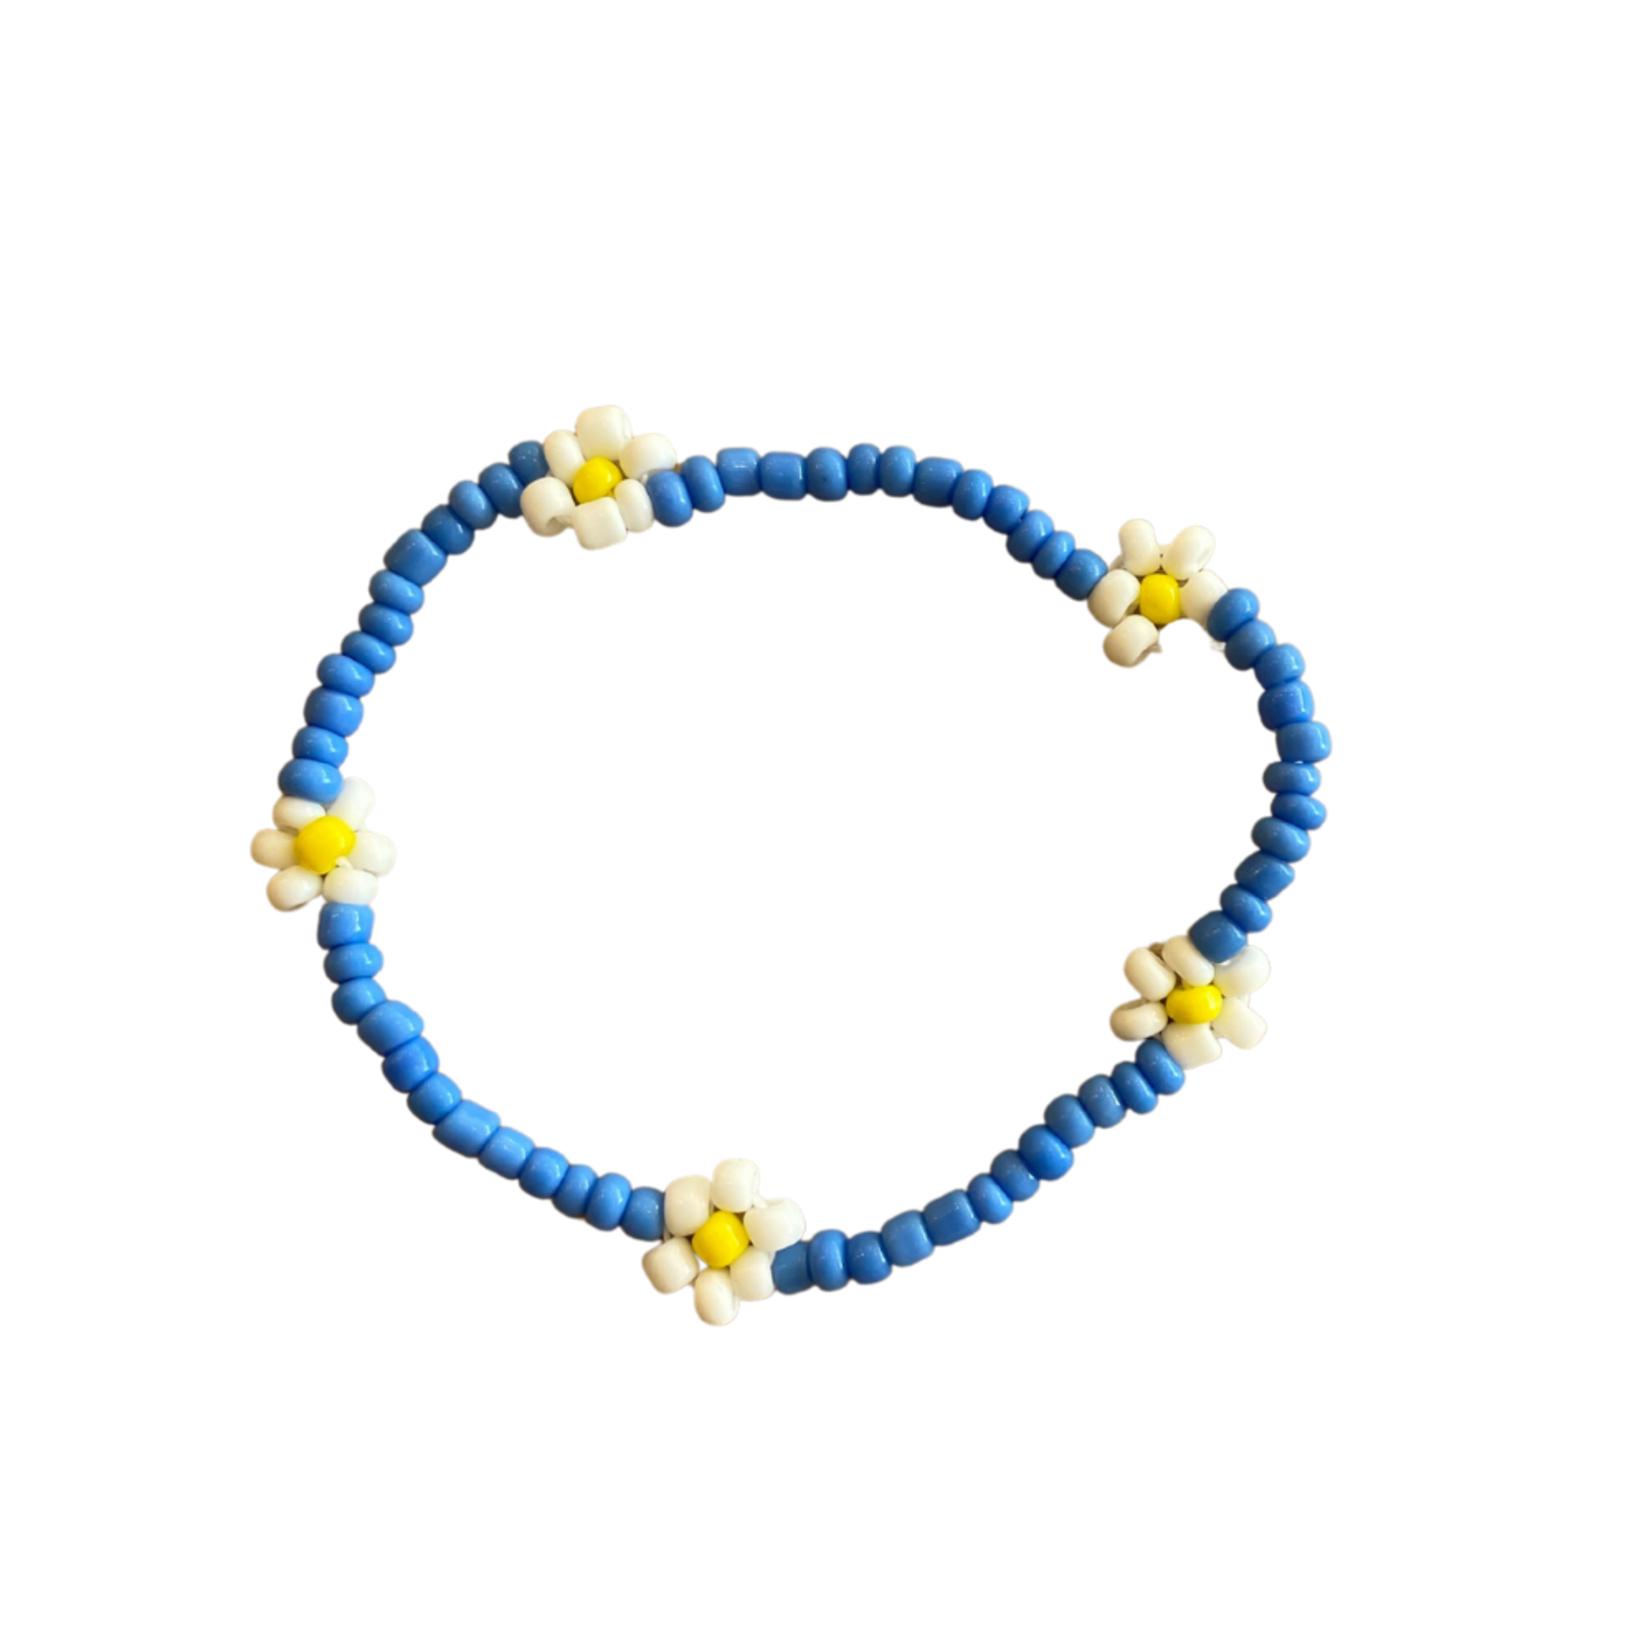 Wyld Blue Assorted Beaded Flower Bracelet